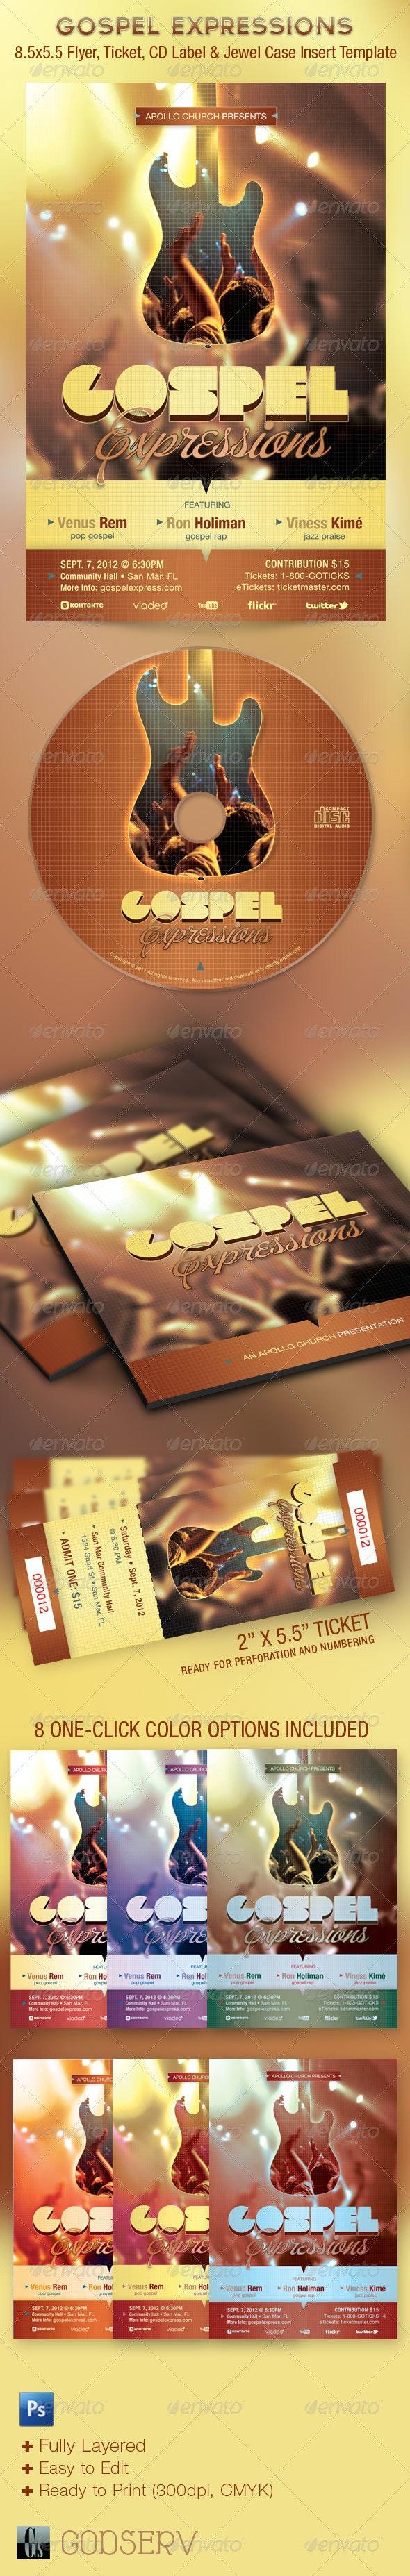 Gospel Expressions Church Flyer Ticket CD Template - Church Flyers